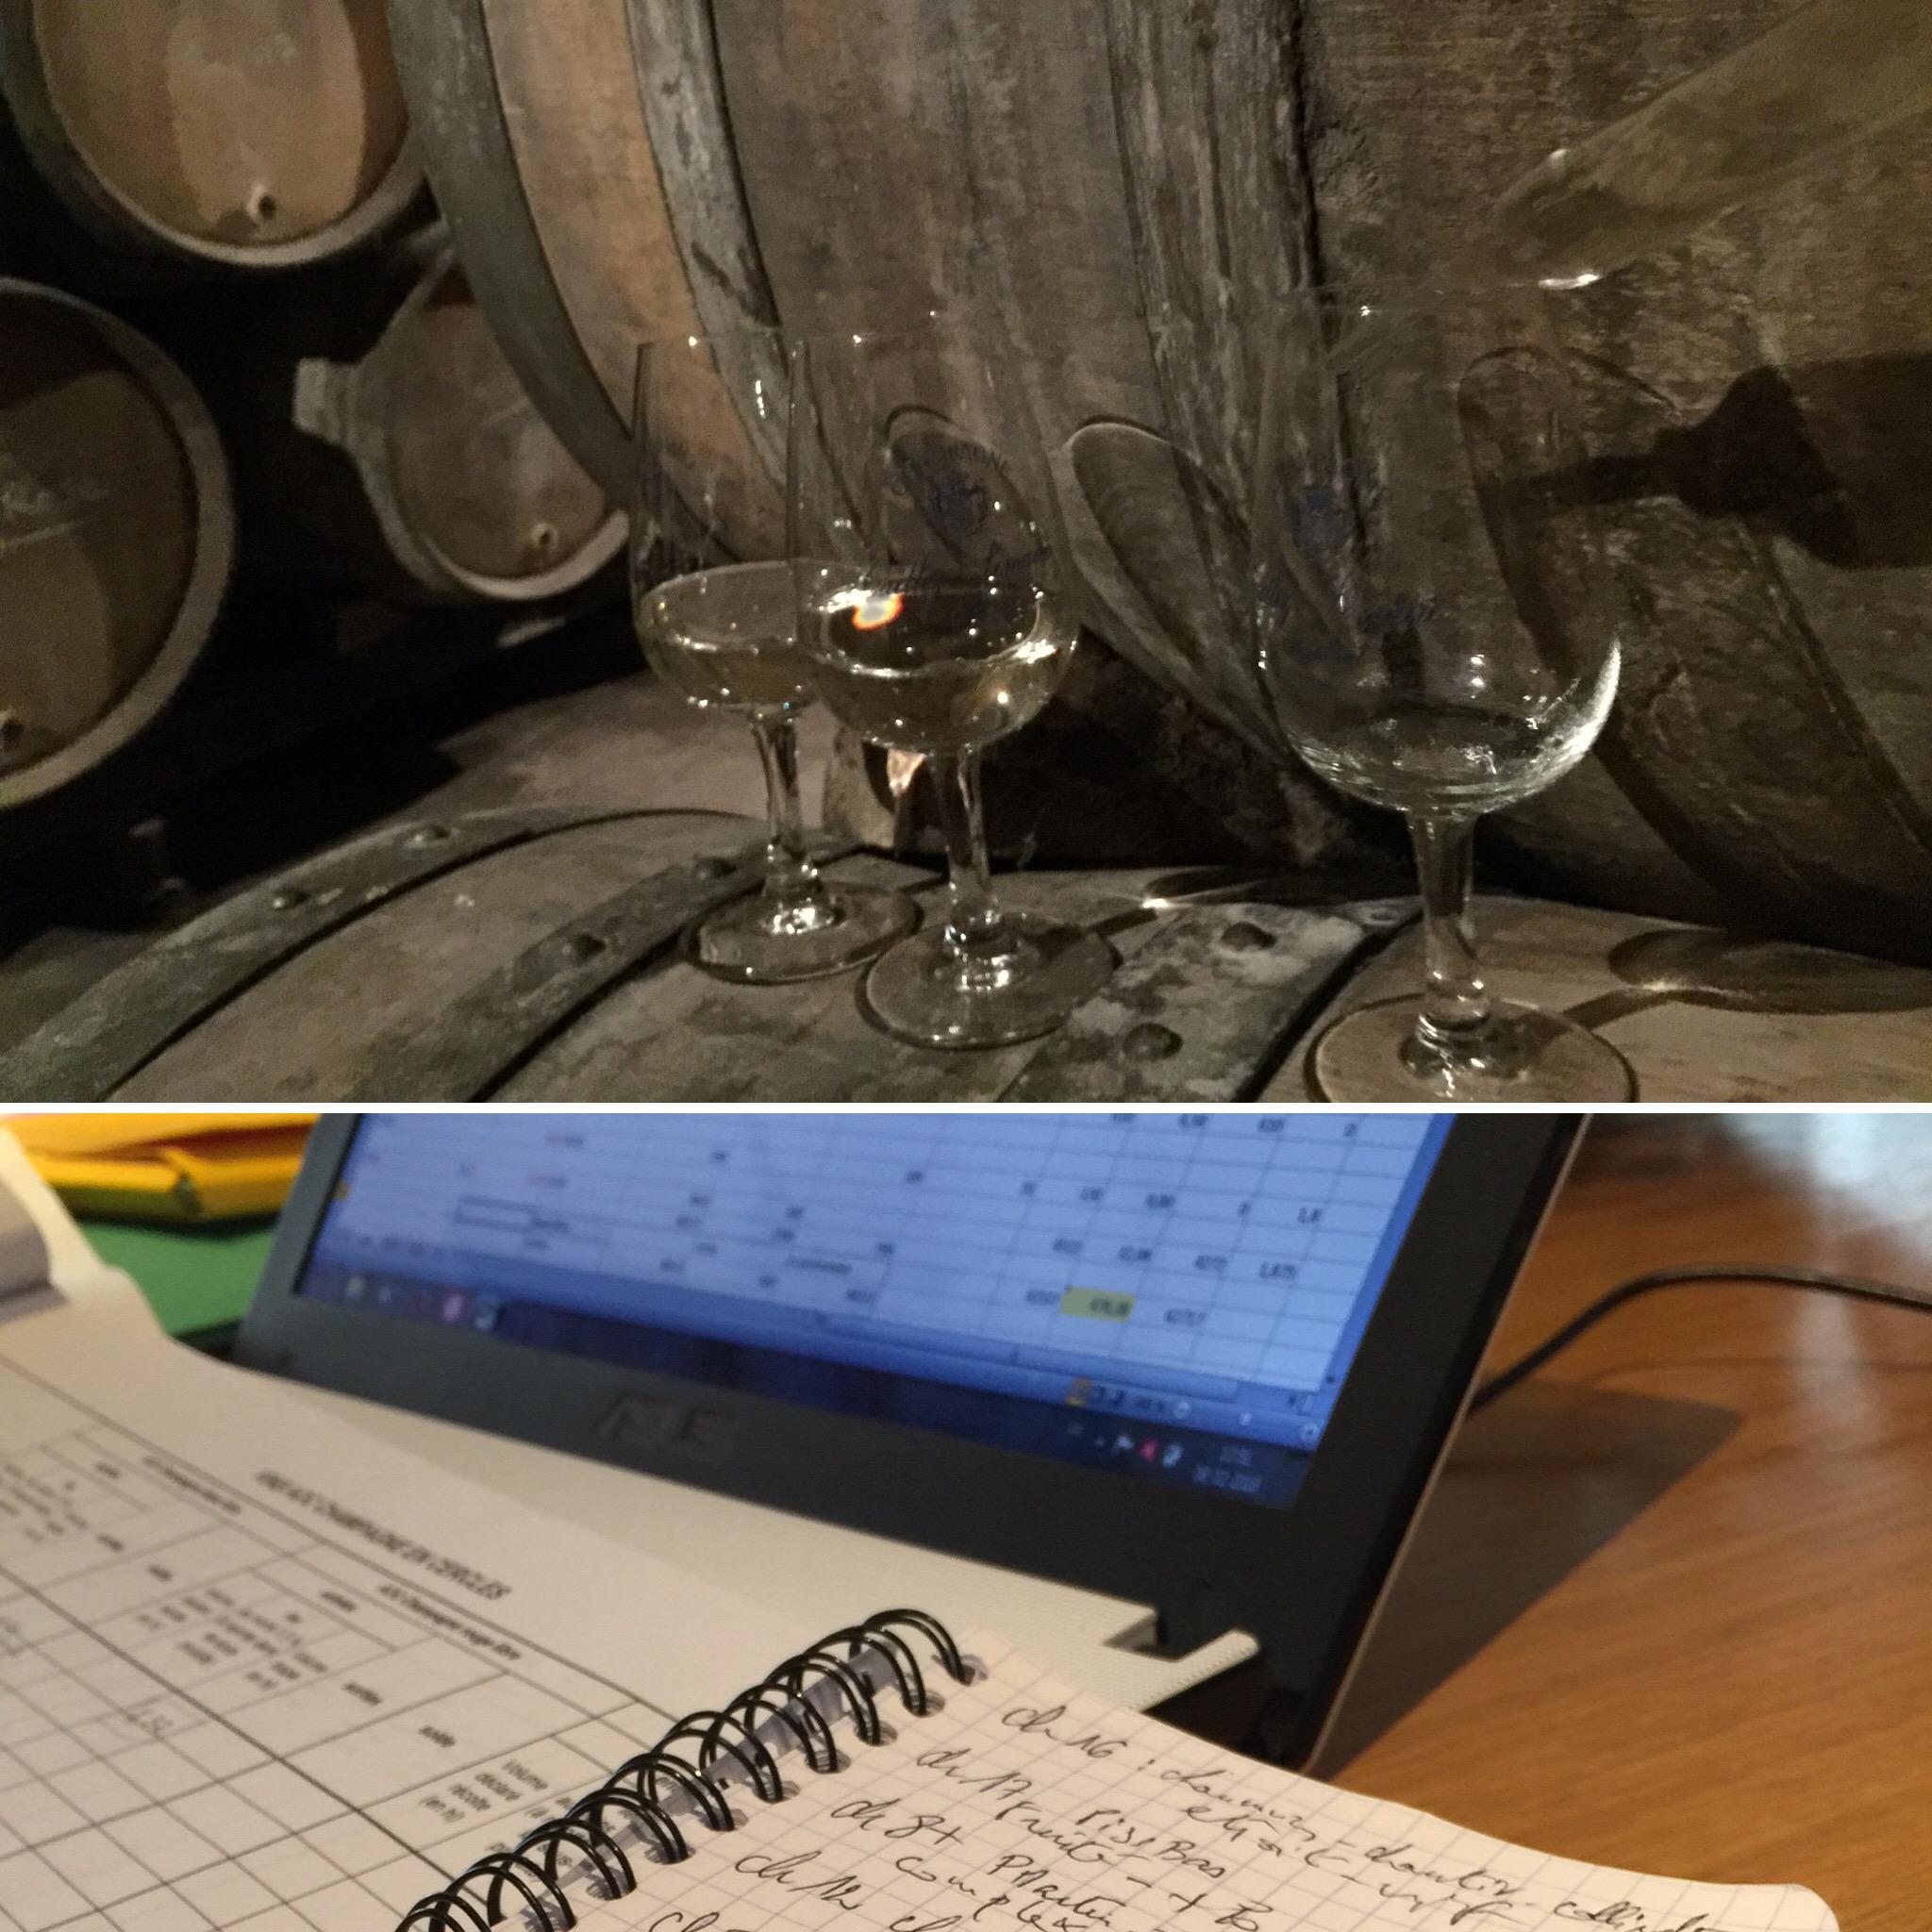 Blending Chardonnay Pinot Noir Meunier Vin clair 2017 Caillez Lemaire